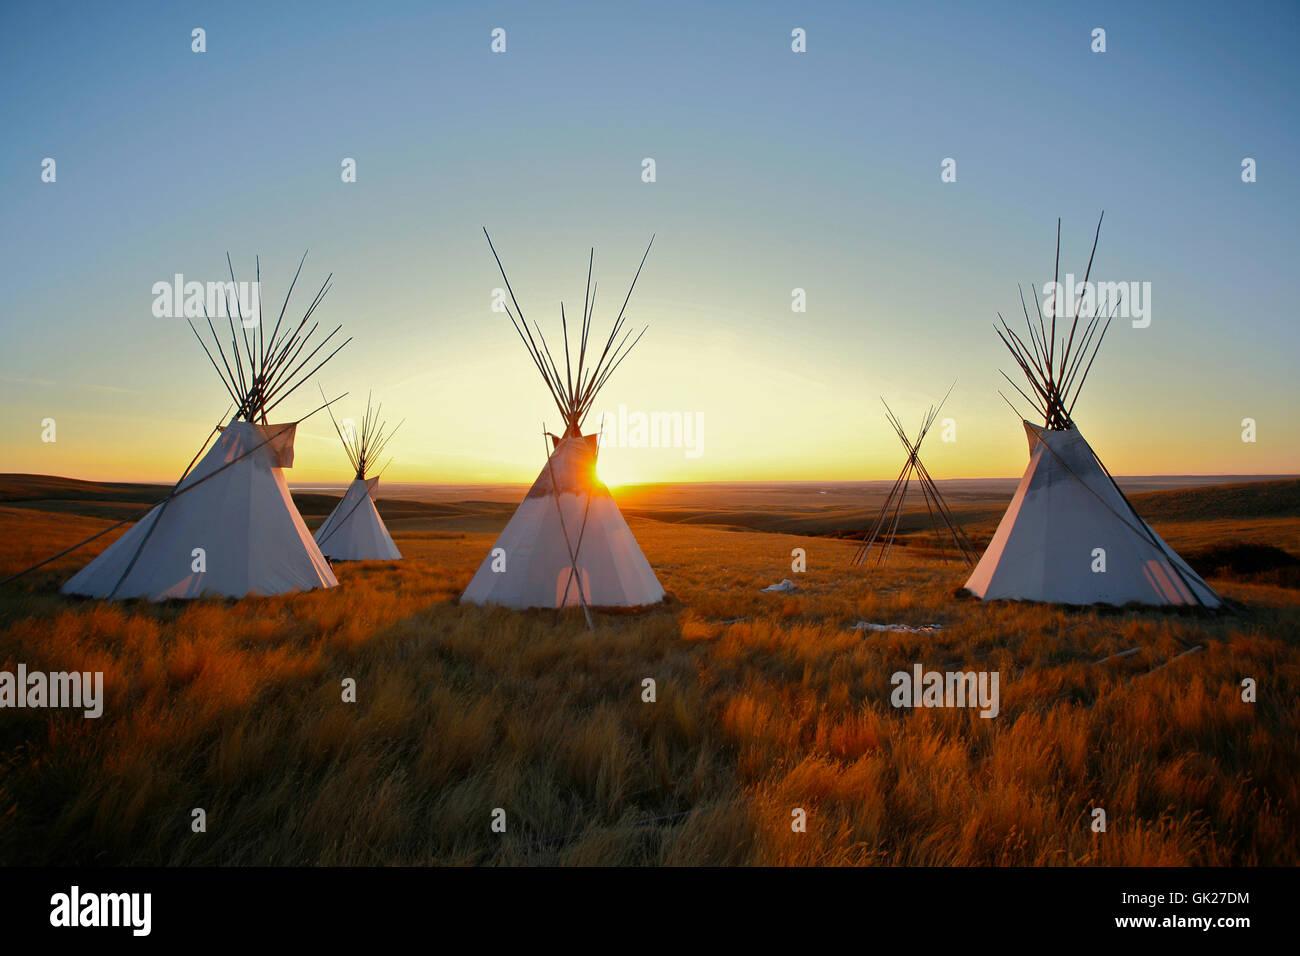 native canada tent - Stock Image